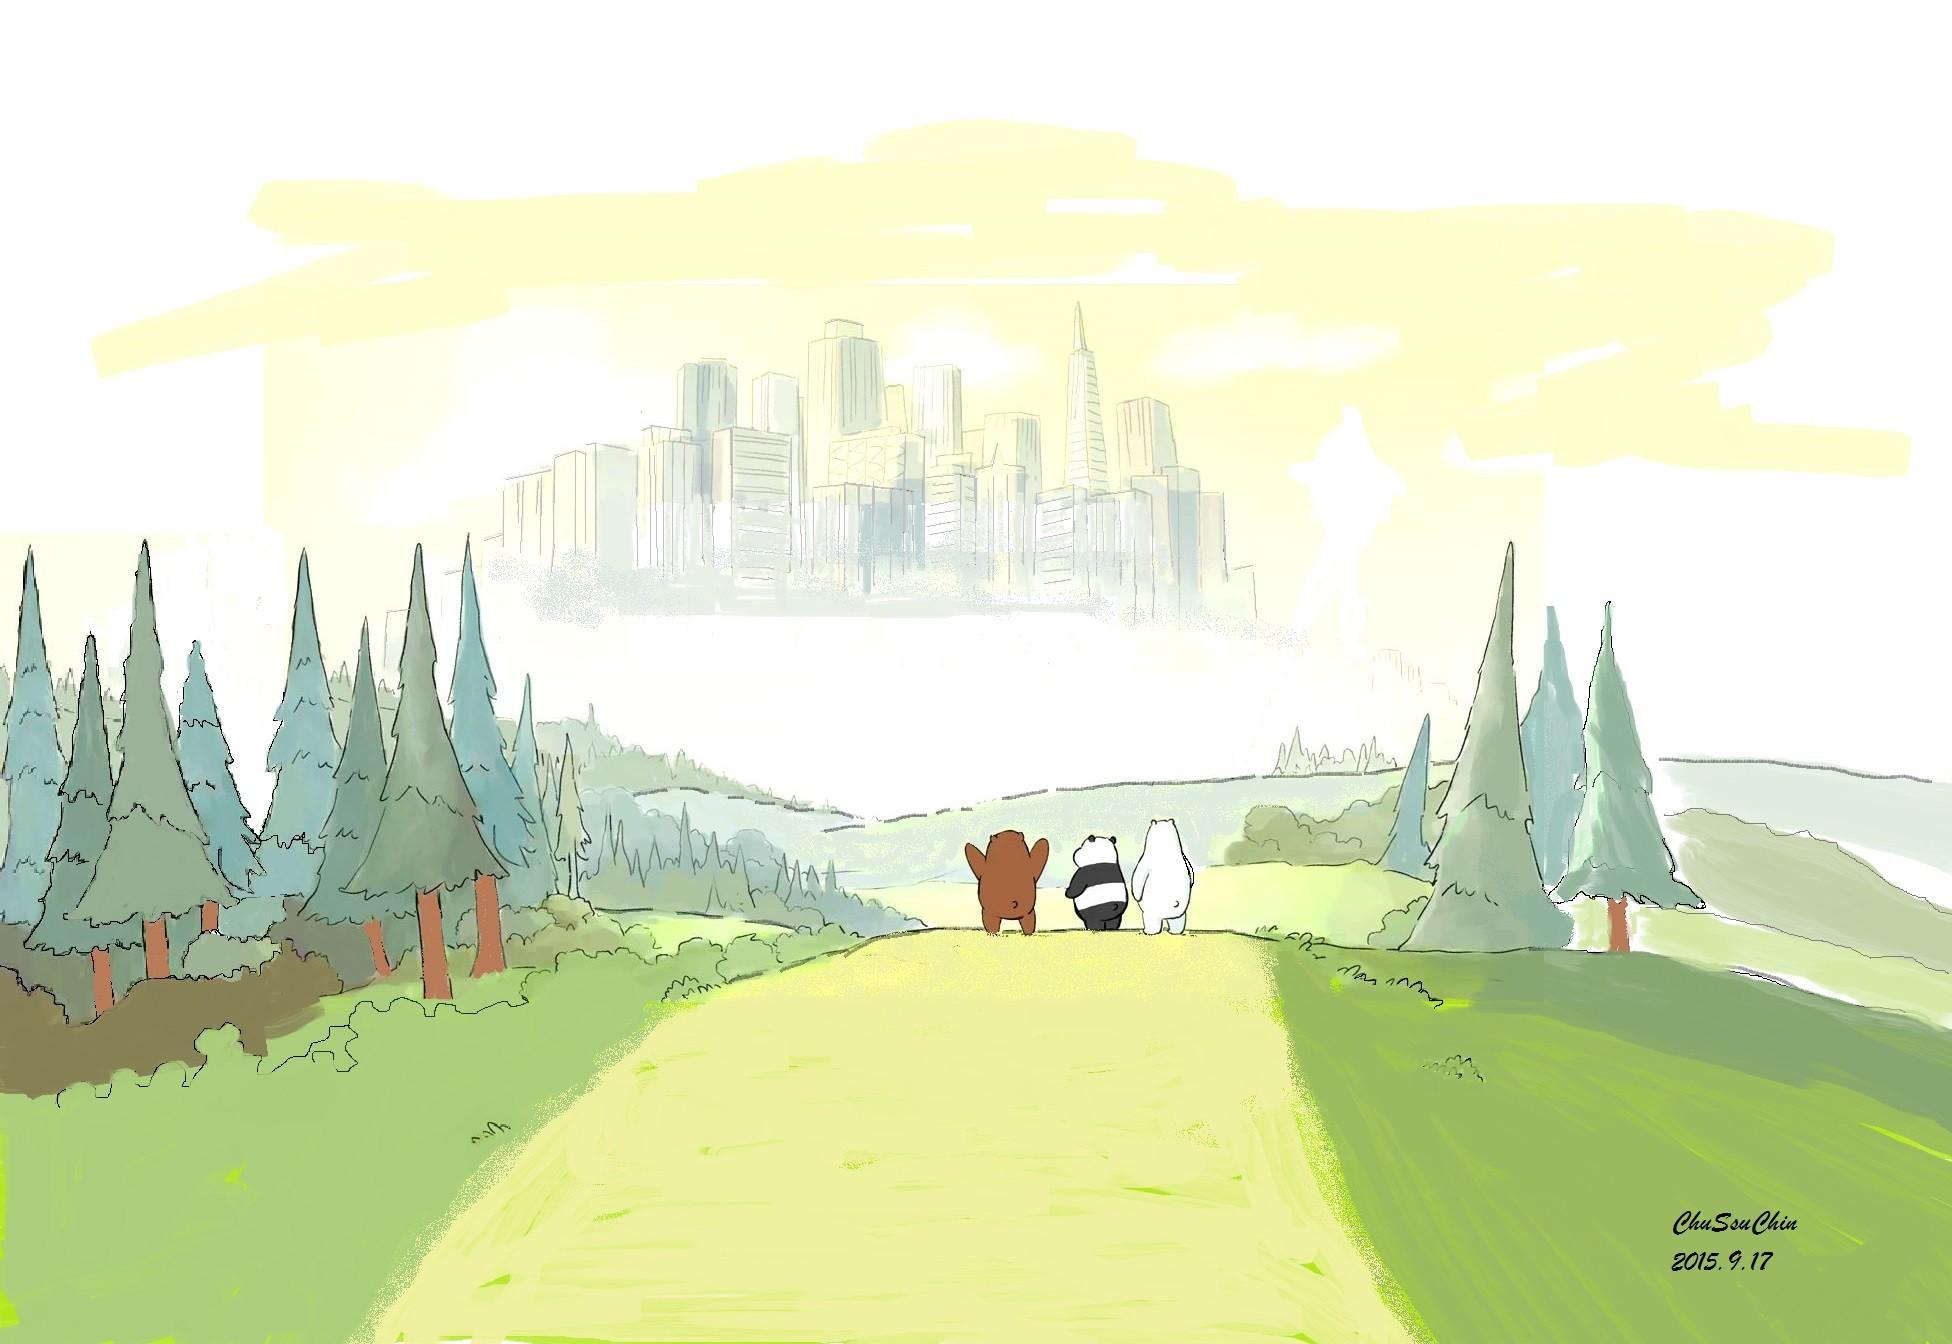 Fondos de pantalla : dibujo, ilustración, dibujos animados, viento,  Nosotros osos desnudos, Terreno, llanura, captura de pantalla, Fenómeno  atmosférico, ecosistema 1952x1344 - Kmaco - 109240 - Fondos de pantalla -  WallHere